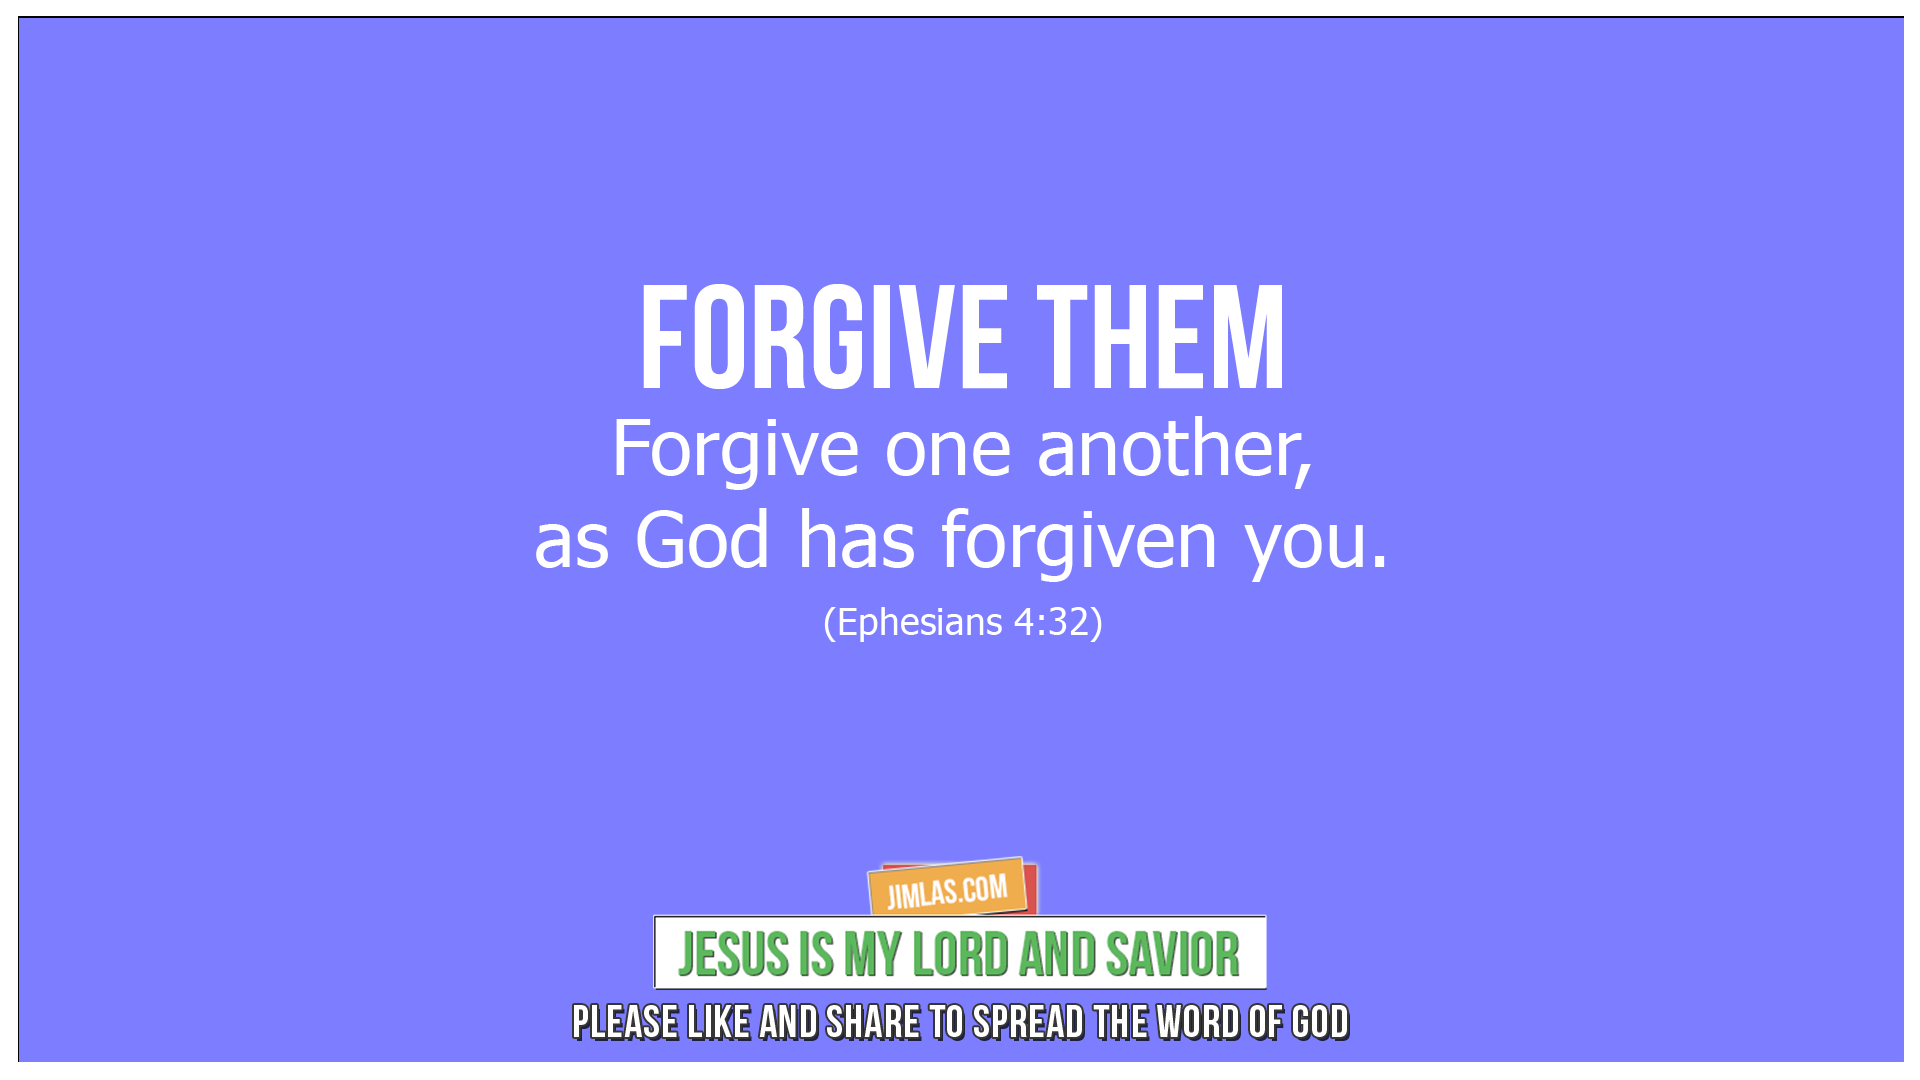 ephesians 4 32, Ephesians 4:32